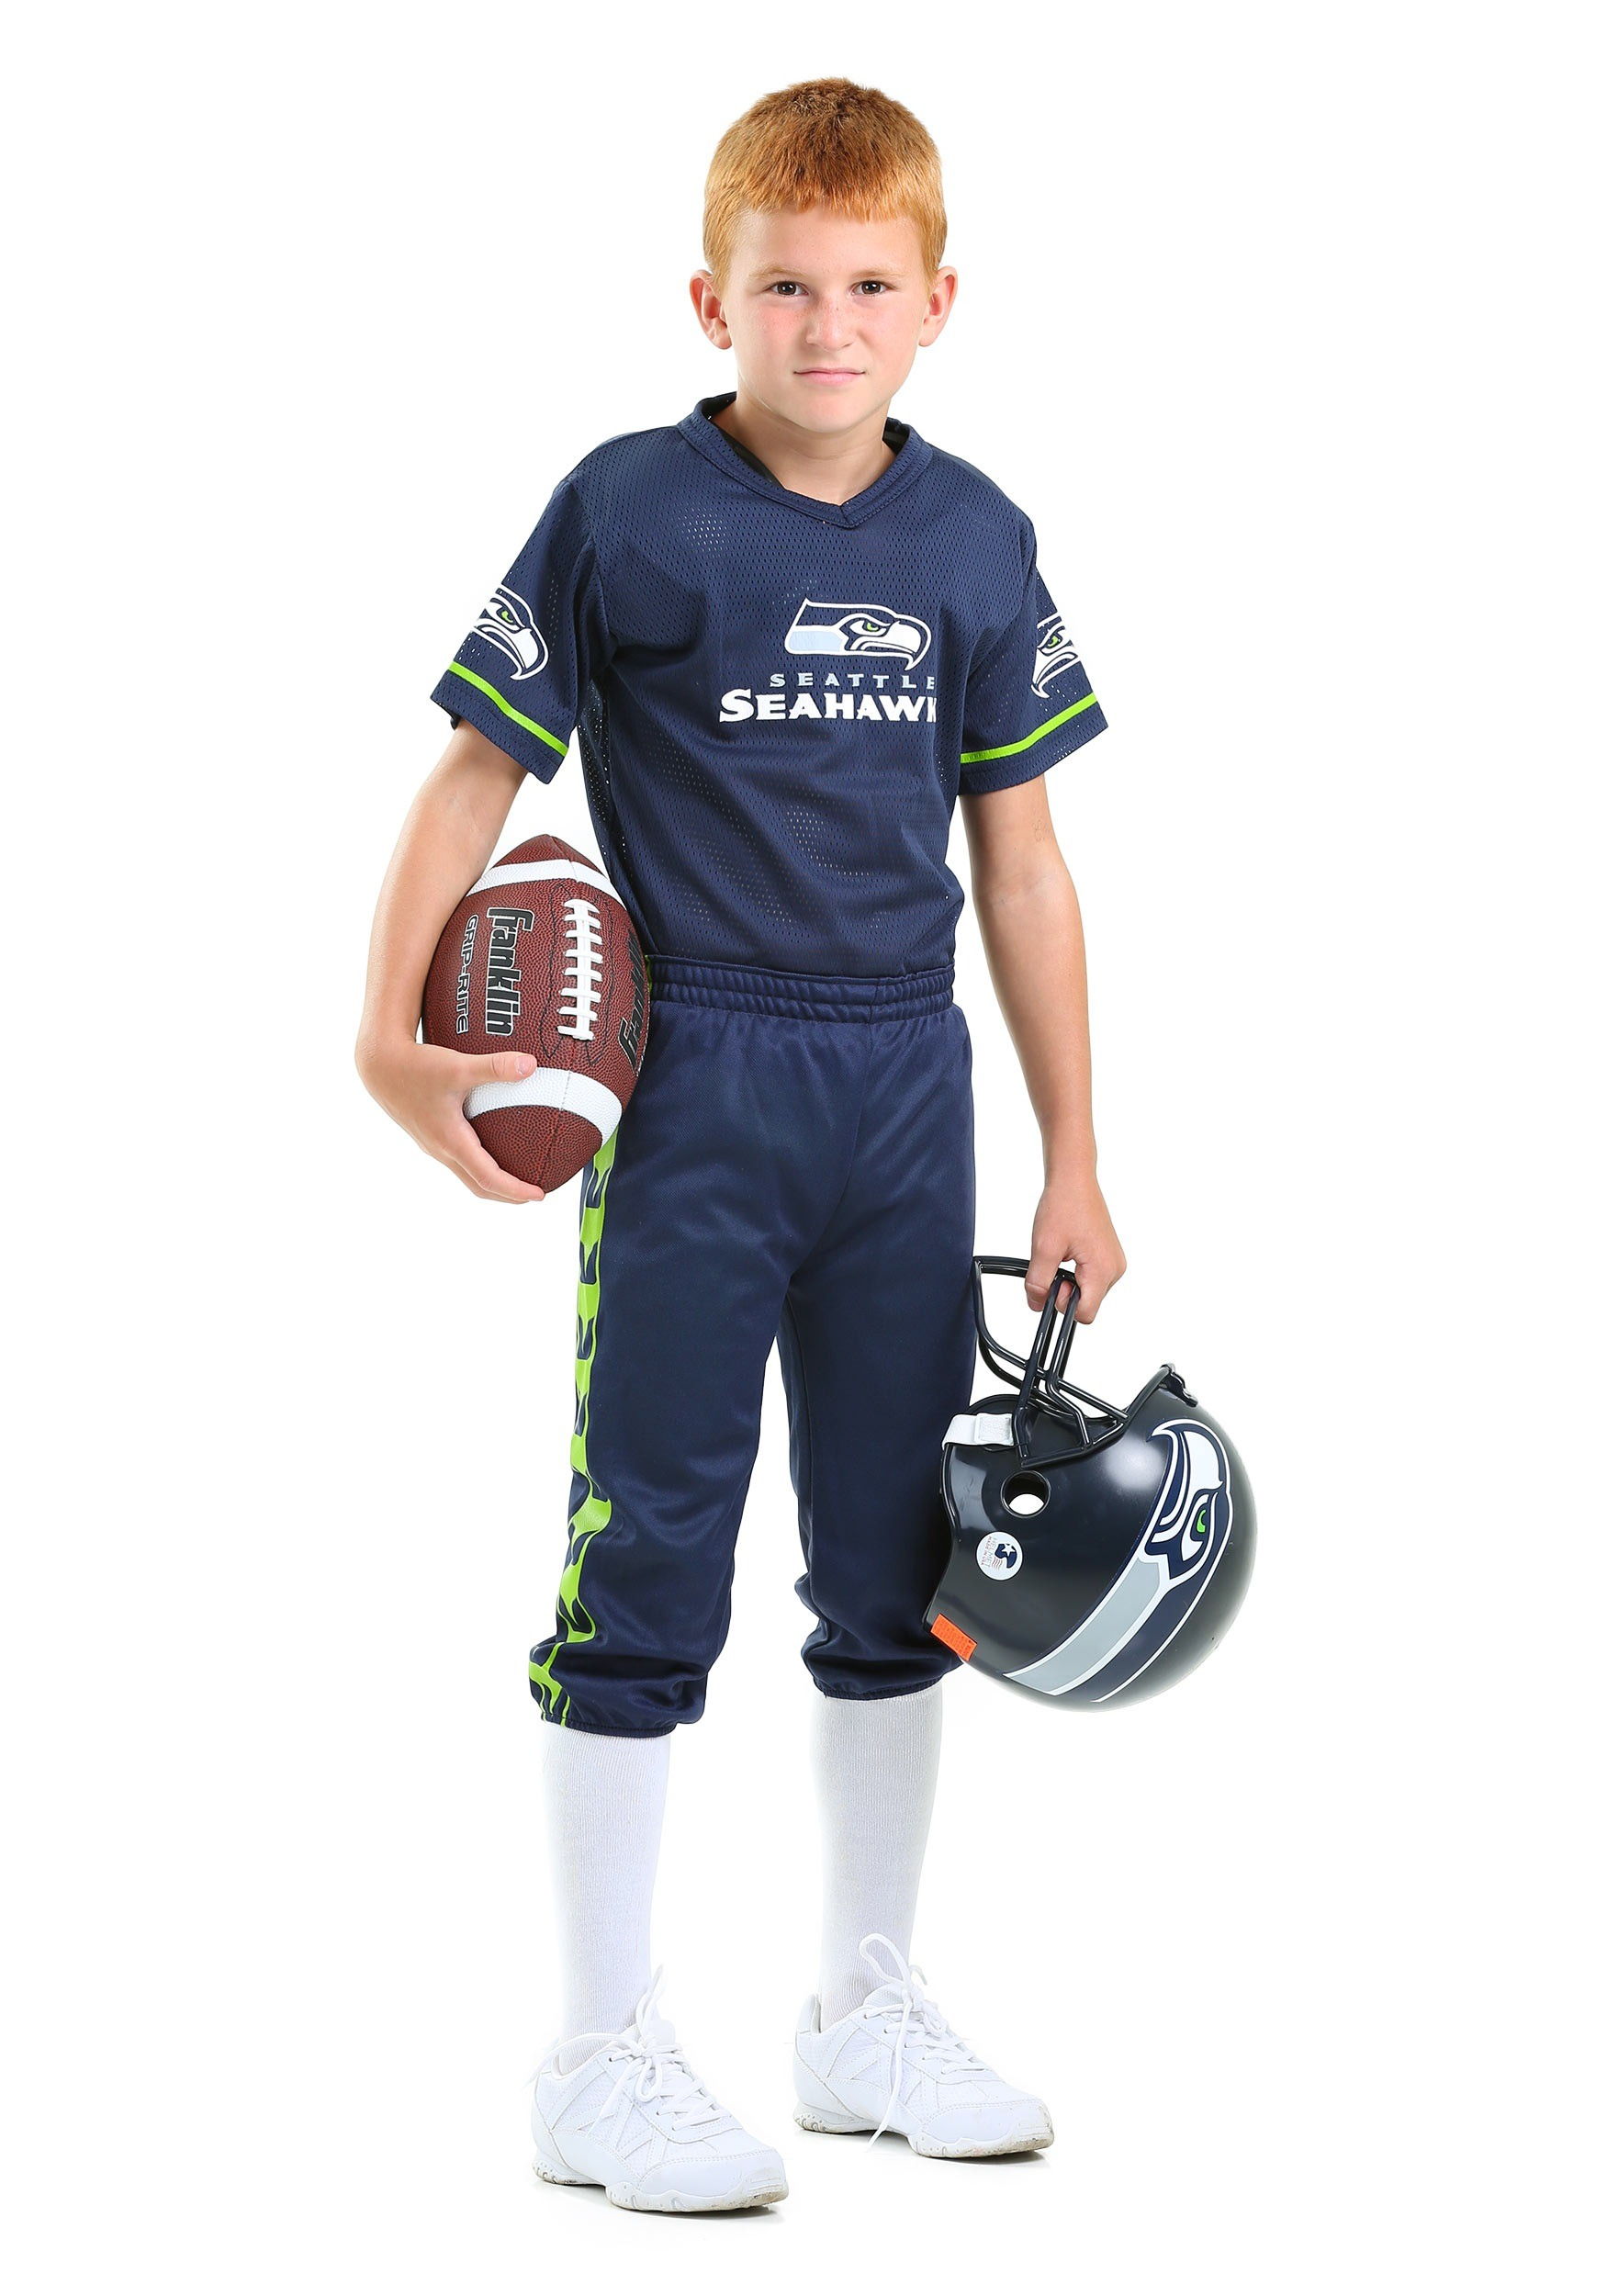 Seahawks Kids NFL Uniform Set